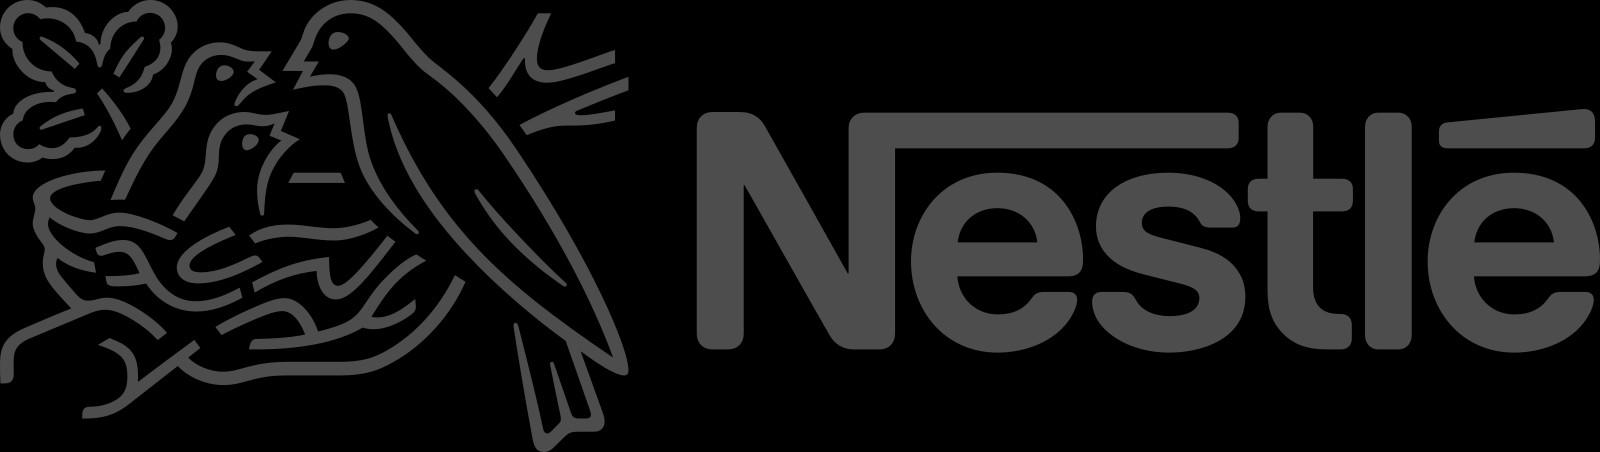 Nestle-logo png